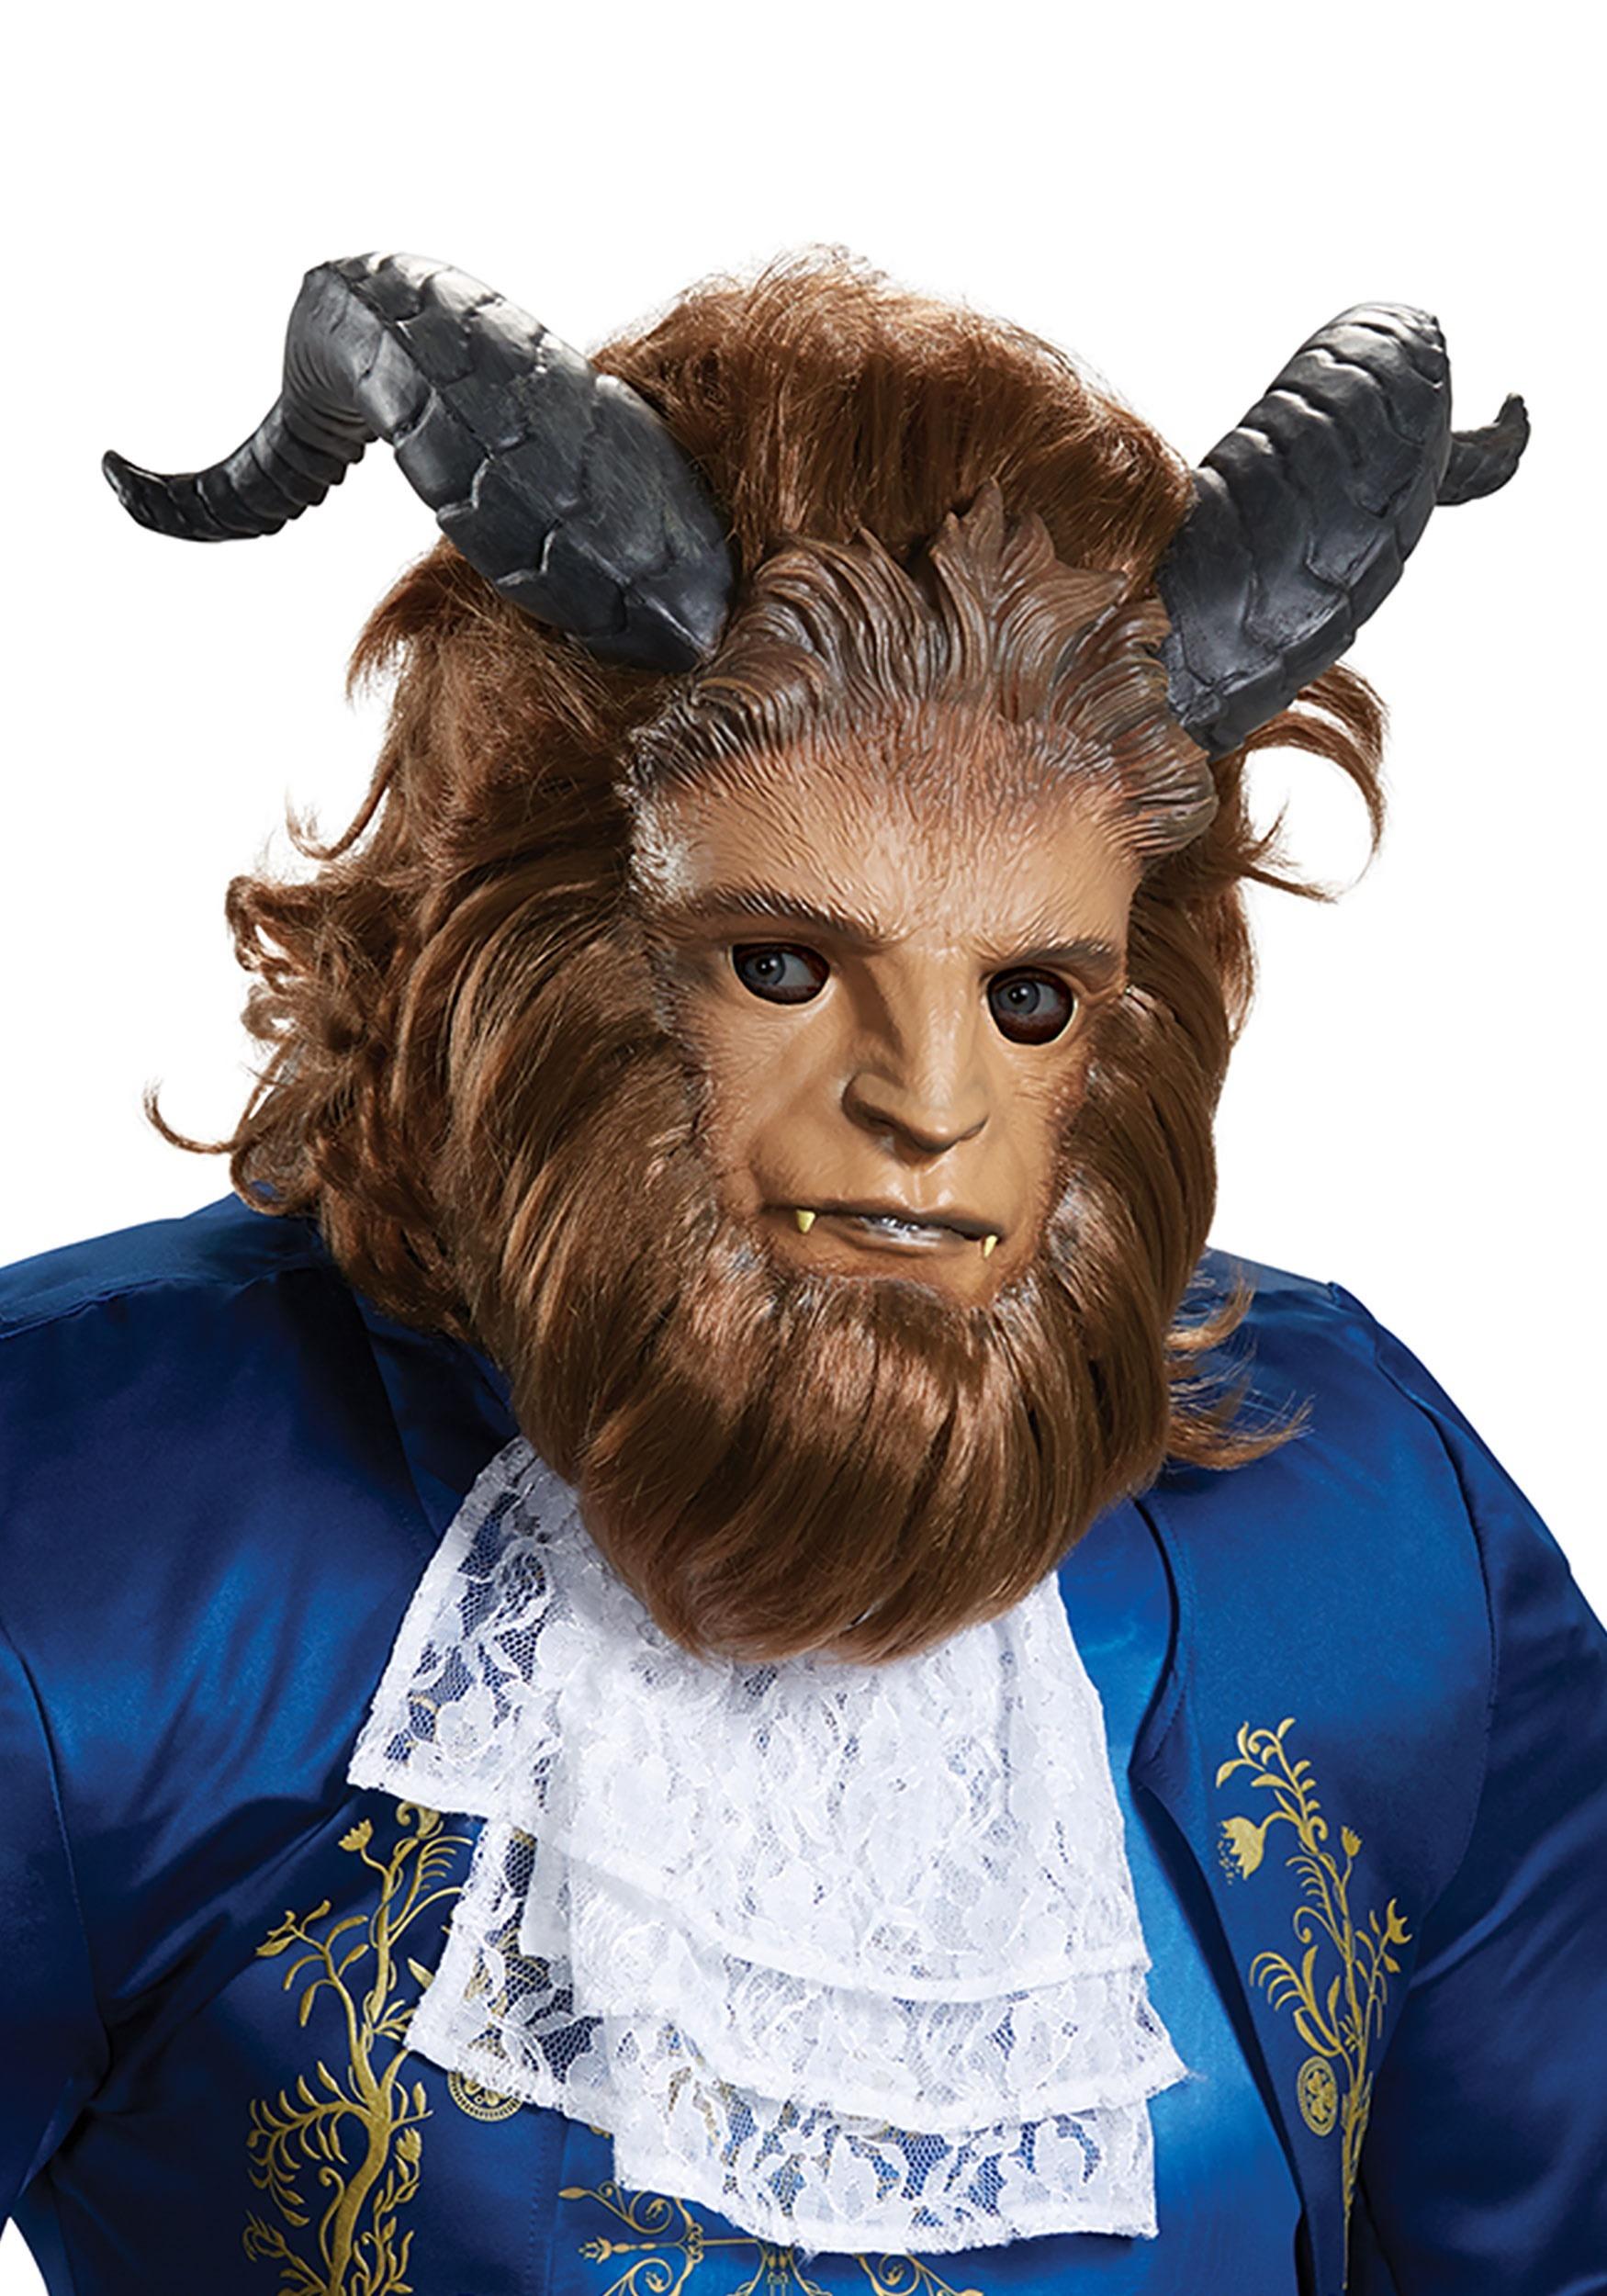 acb5b832f5 Beauty and the Beast Ultra Prestige Beast Mask